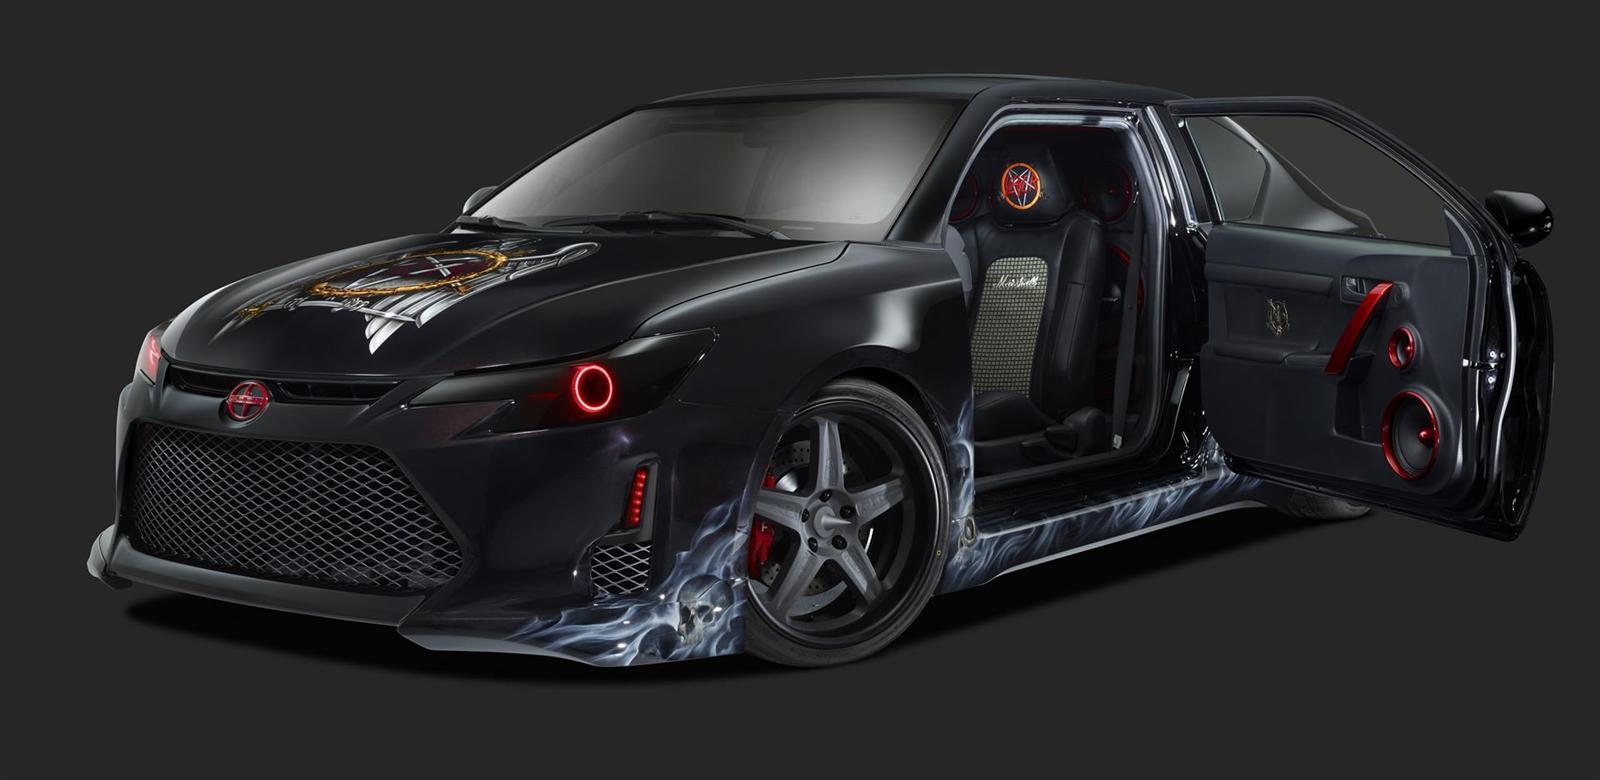 2014 Scion Killer-Sounding Slayer tC